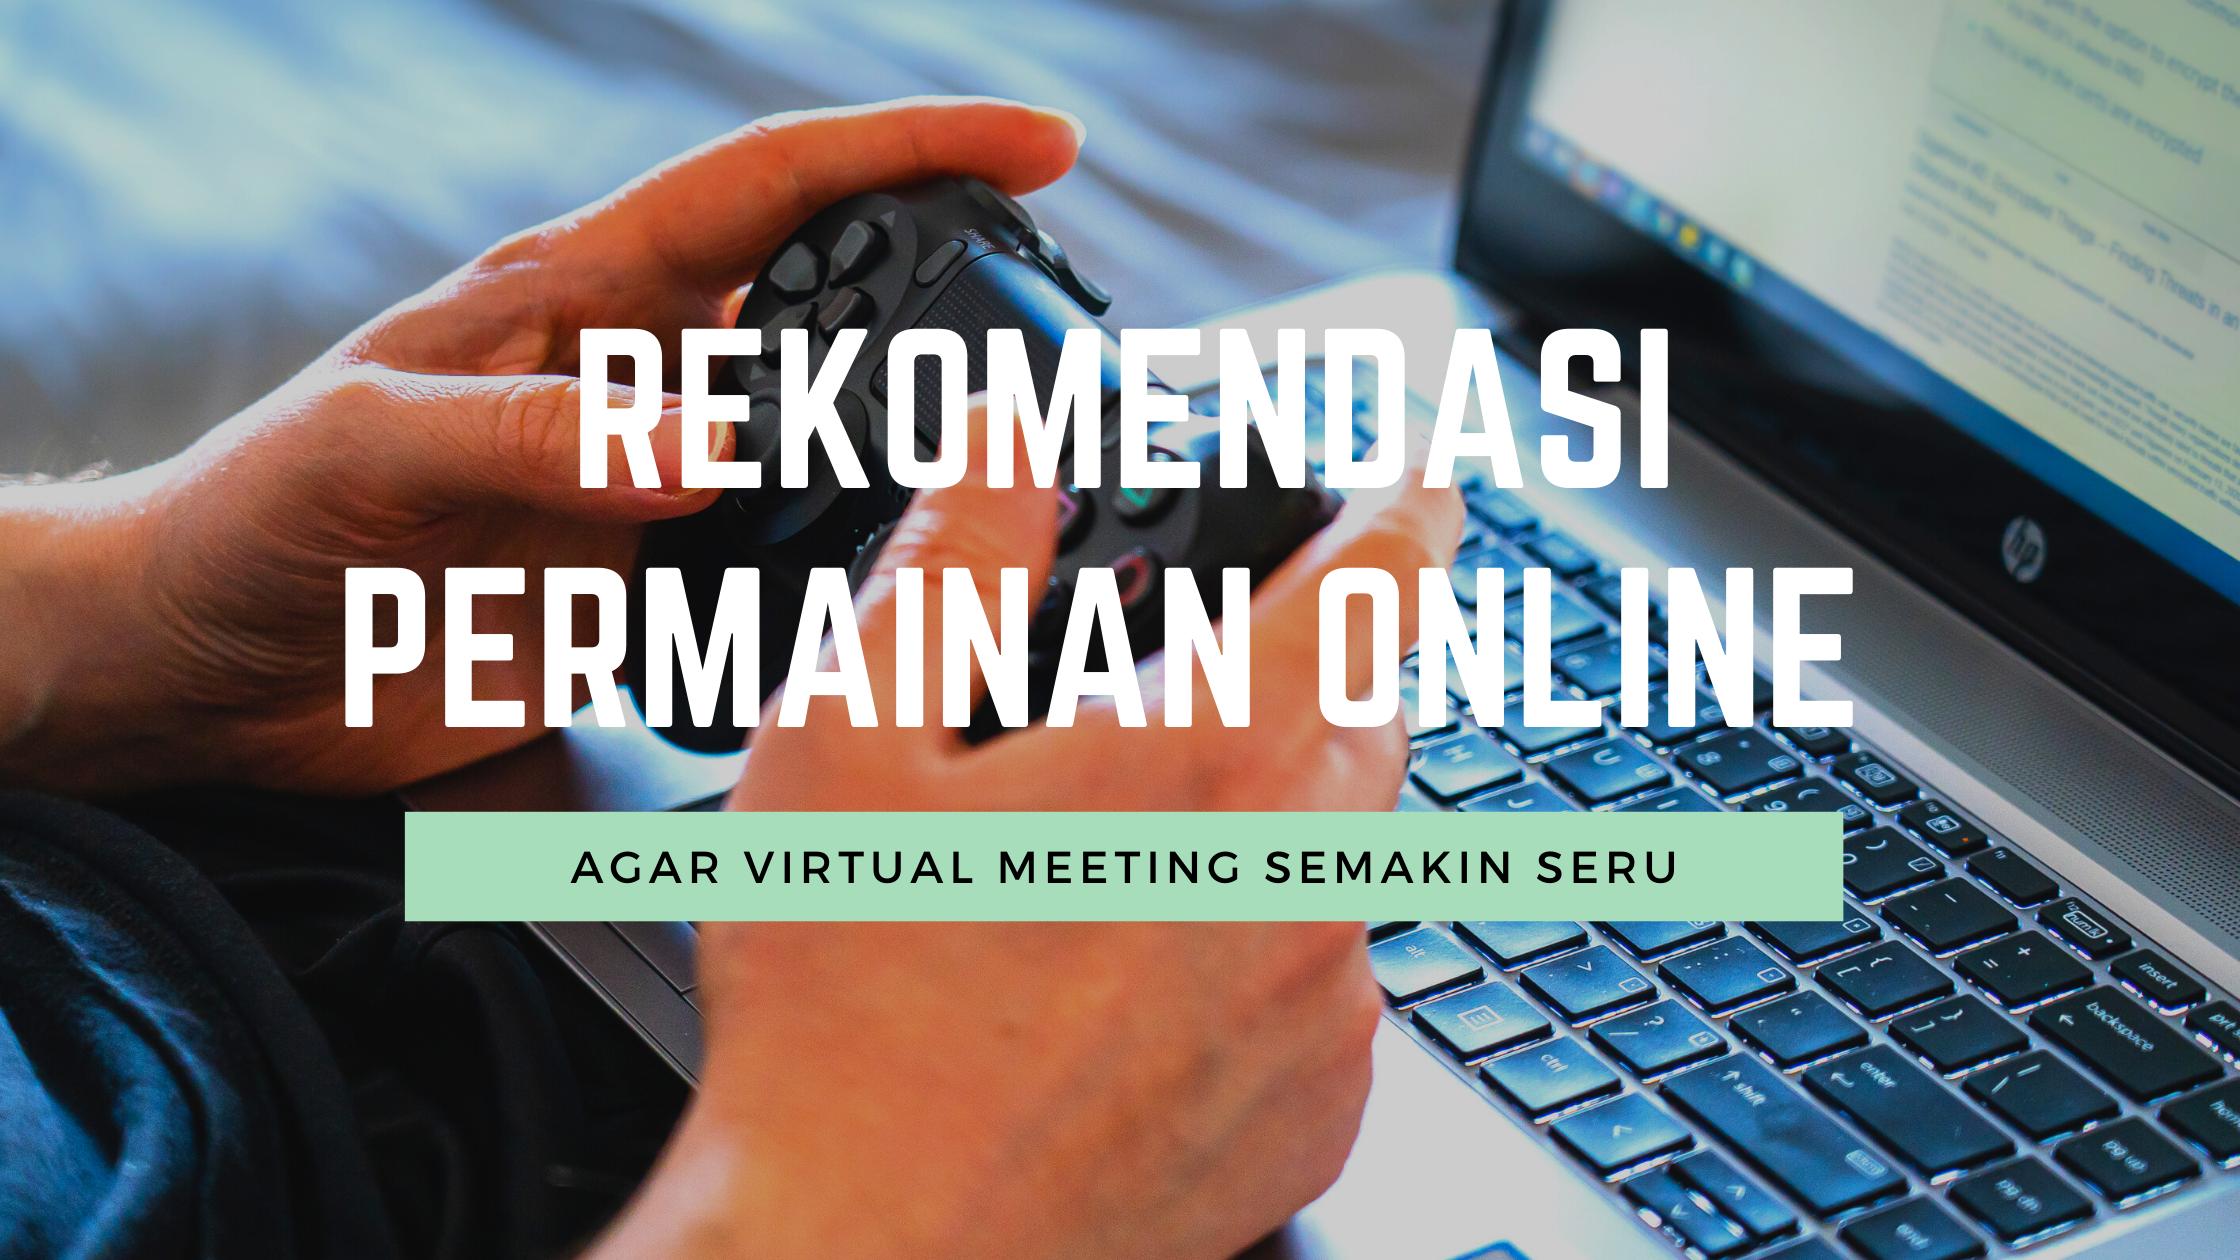 Rekomendasi Permainan Online Agar Virtual Meeting Semakin Seru